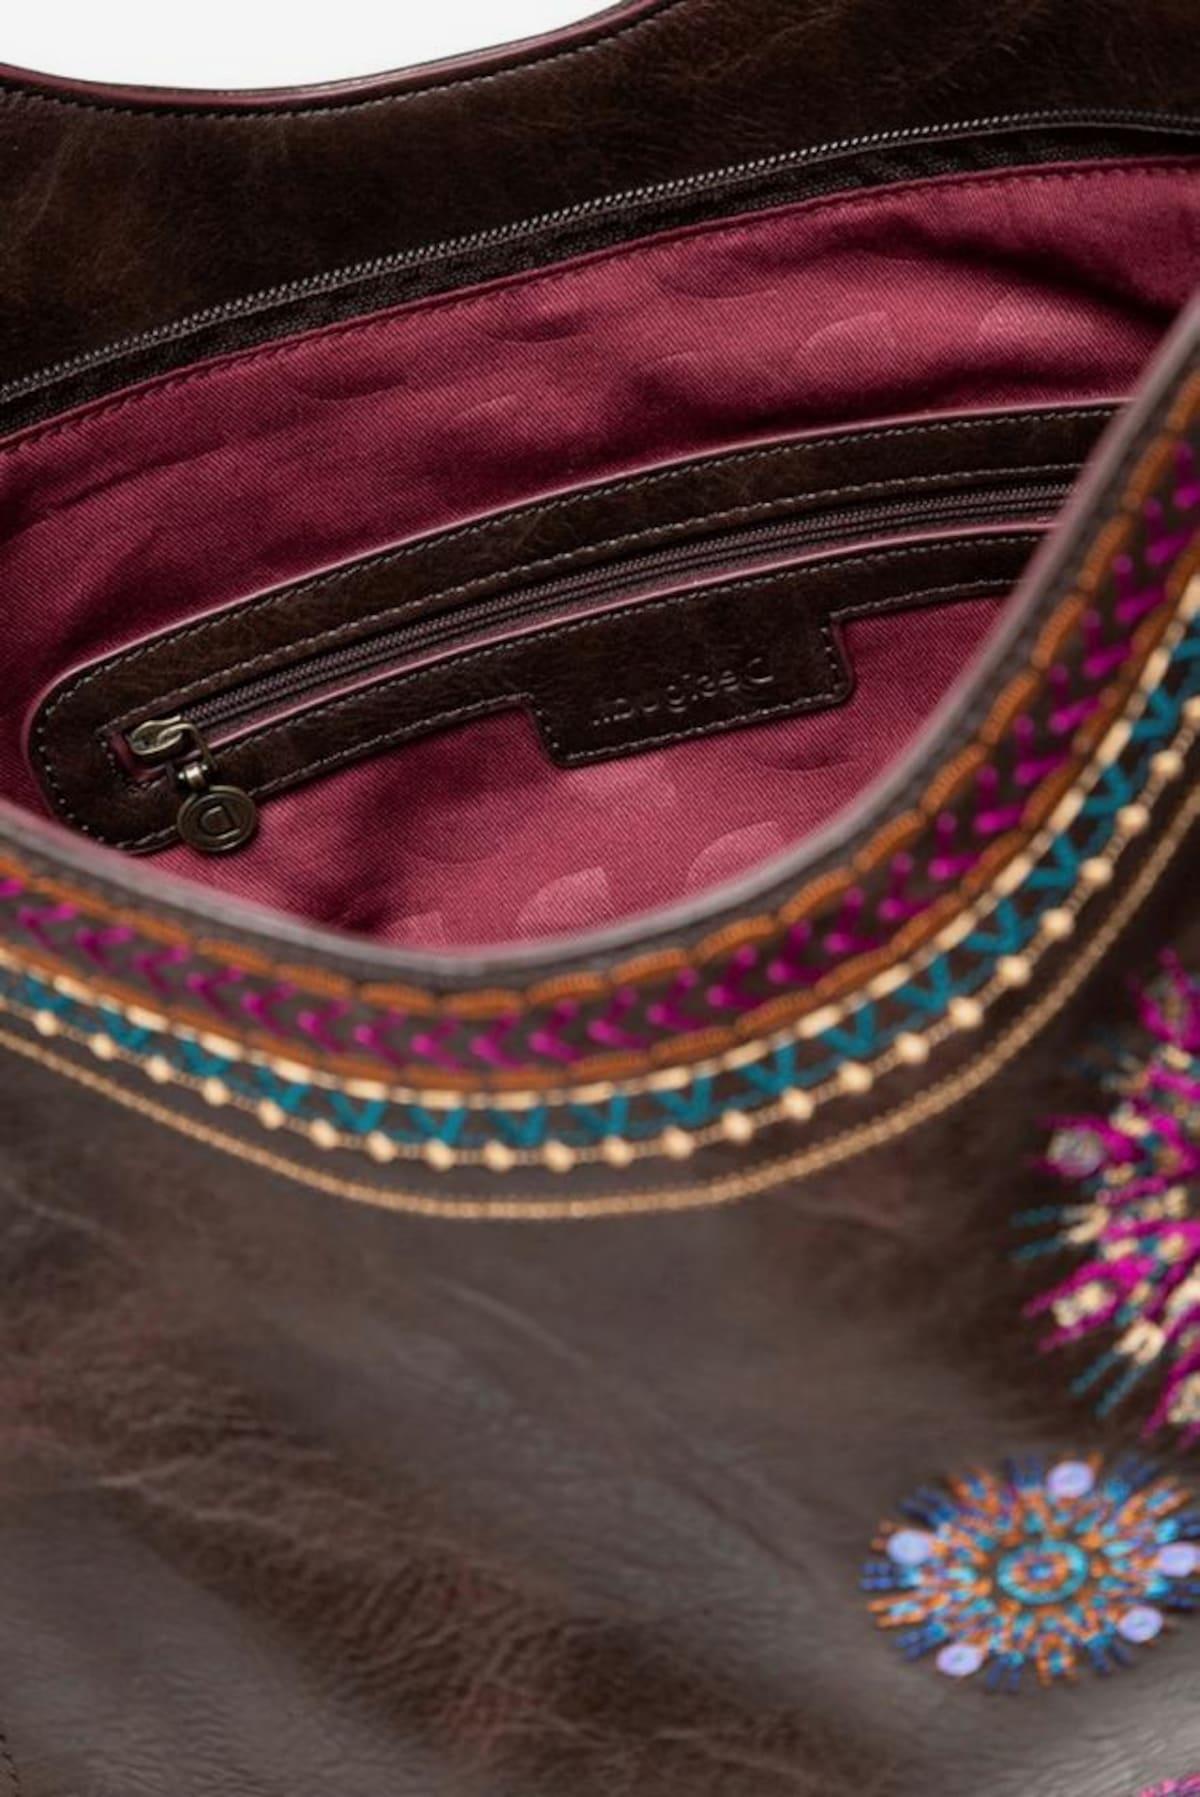 Verkoop Accessoires Desigual Shopper 'BOLS_ASTORIA ROTTERDAM' in Donkerbruin